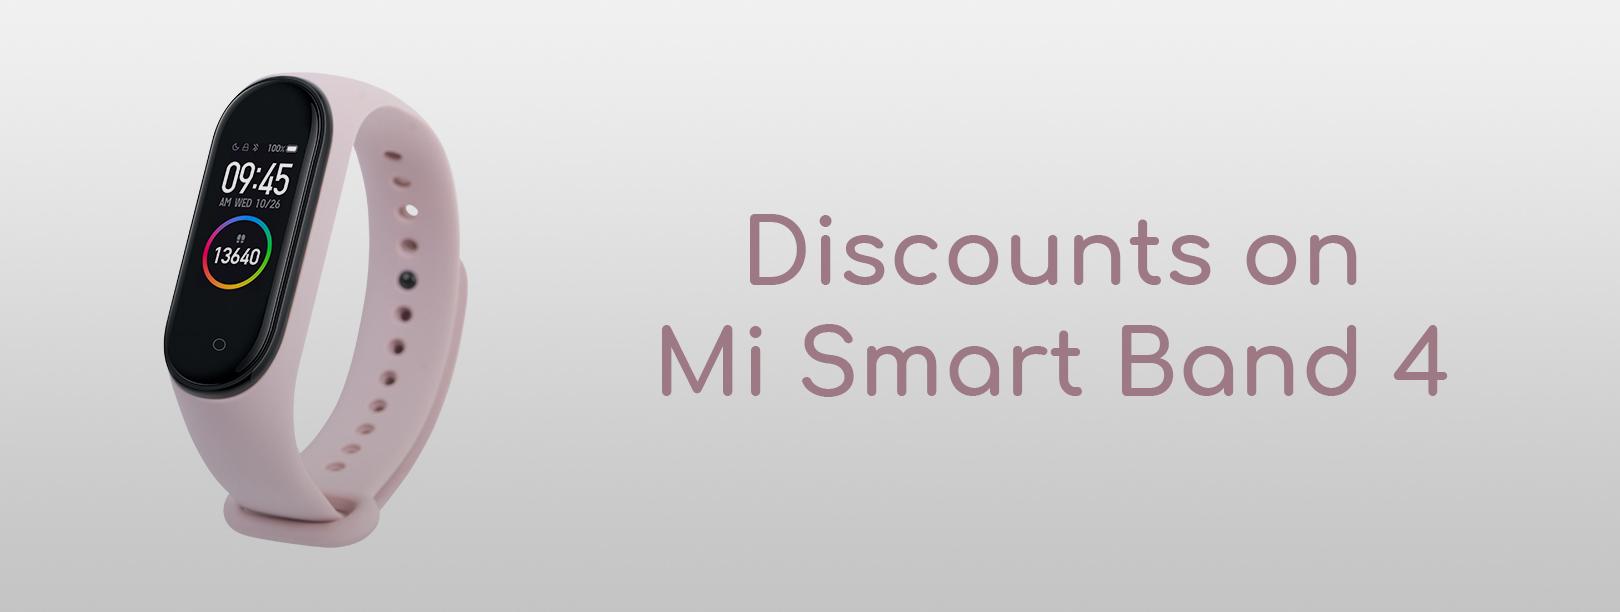 Flipkart Mi Smart Band 4